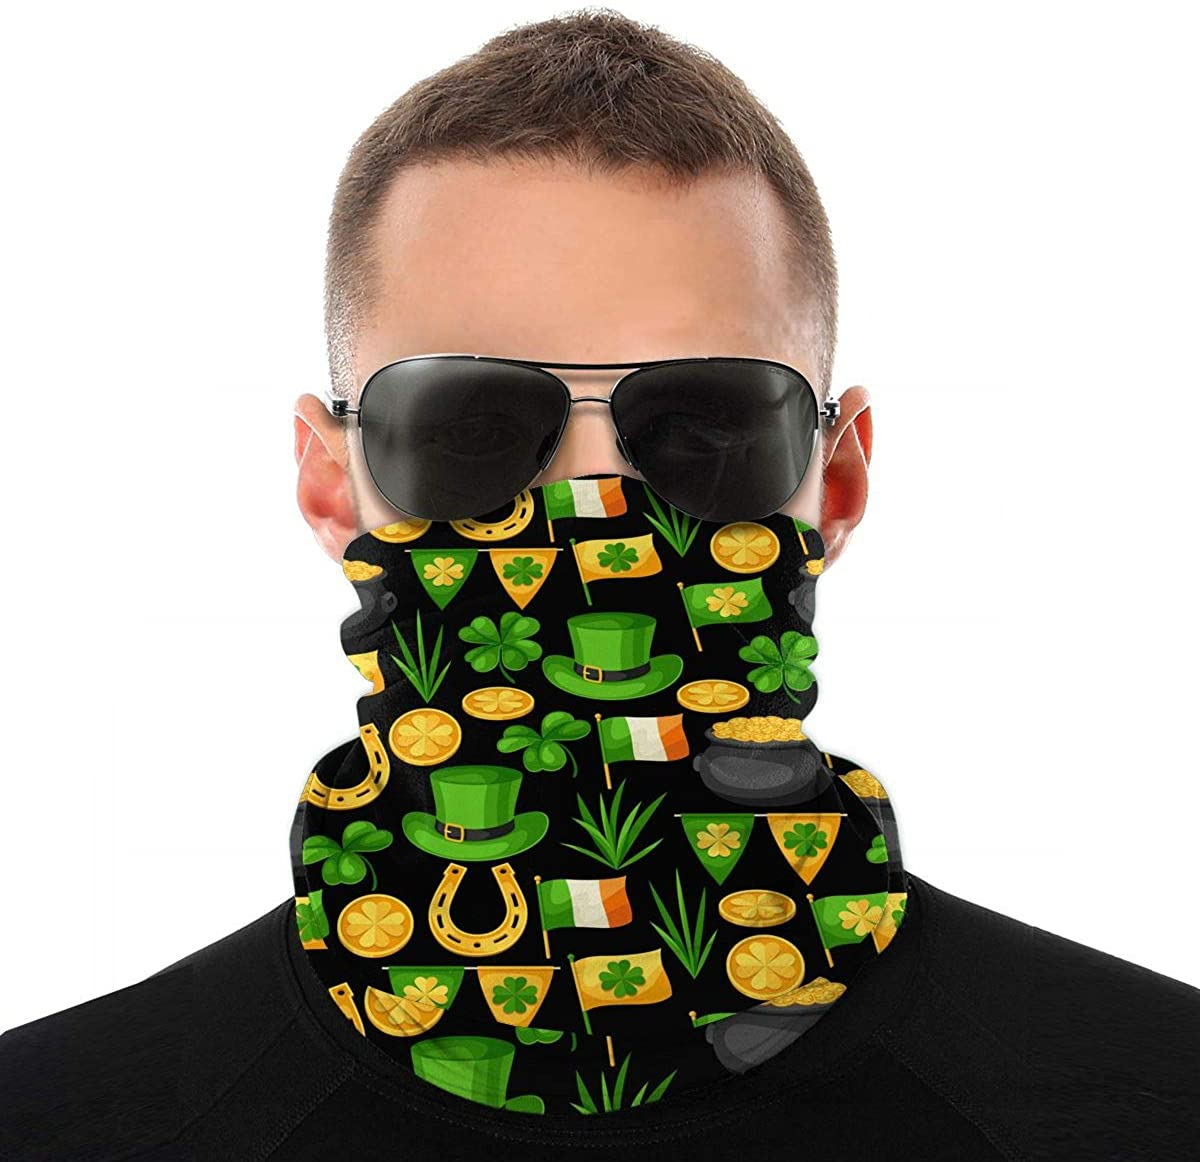 Flag-Ireland St. Patrick'S Day Novelty Neck Gaiter Unisex Adult Windproof Mask Dust Sports Face Mask Half Balaclava Weather Bandana Women Men Outdoors Festivals